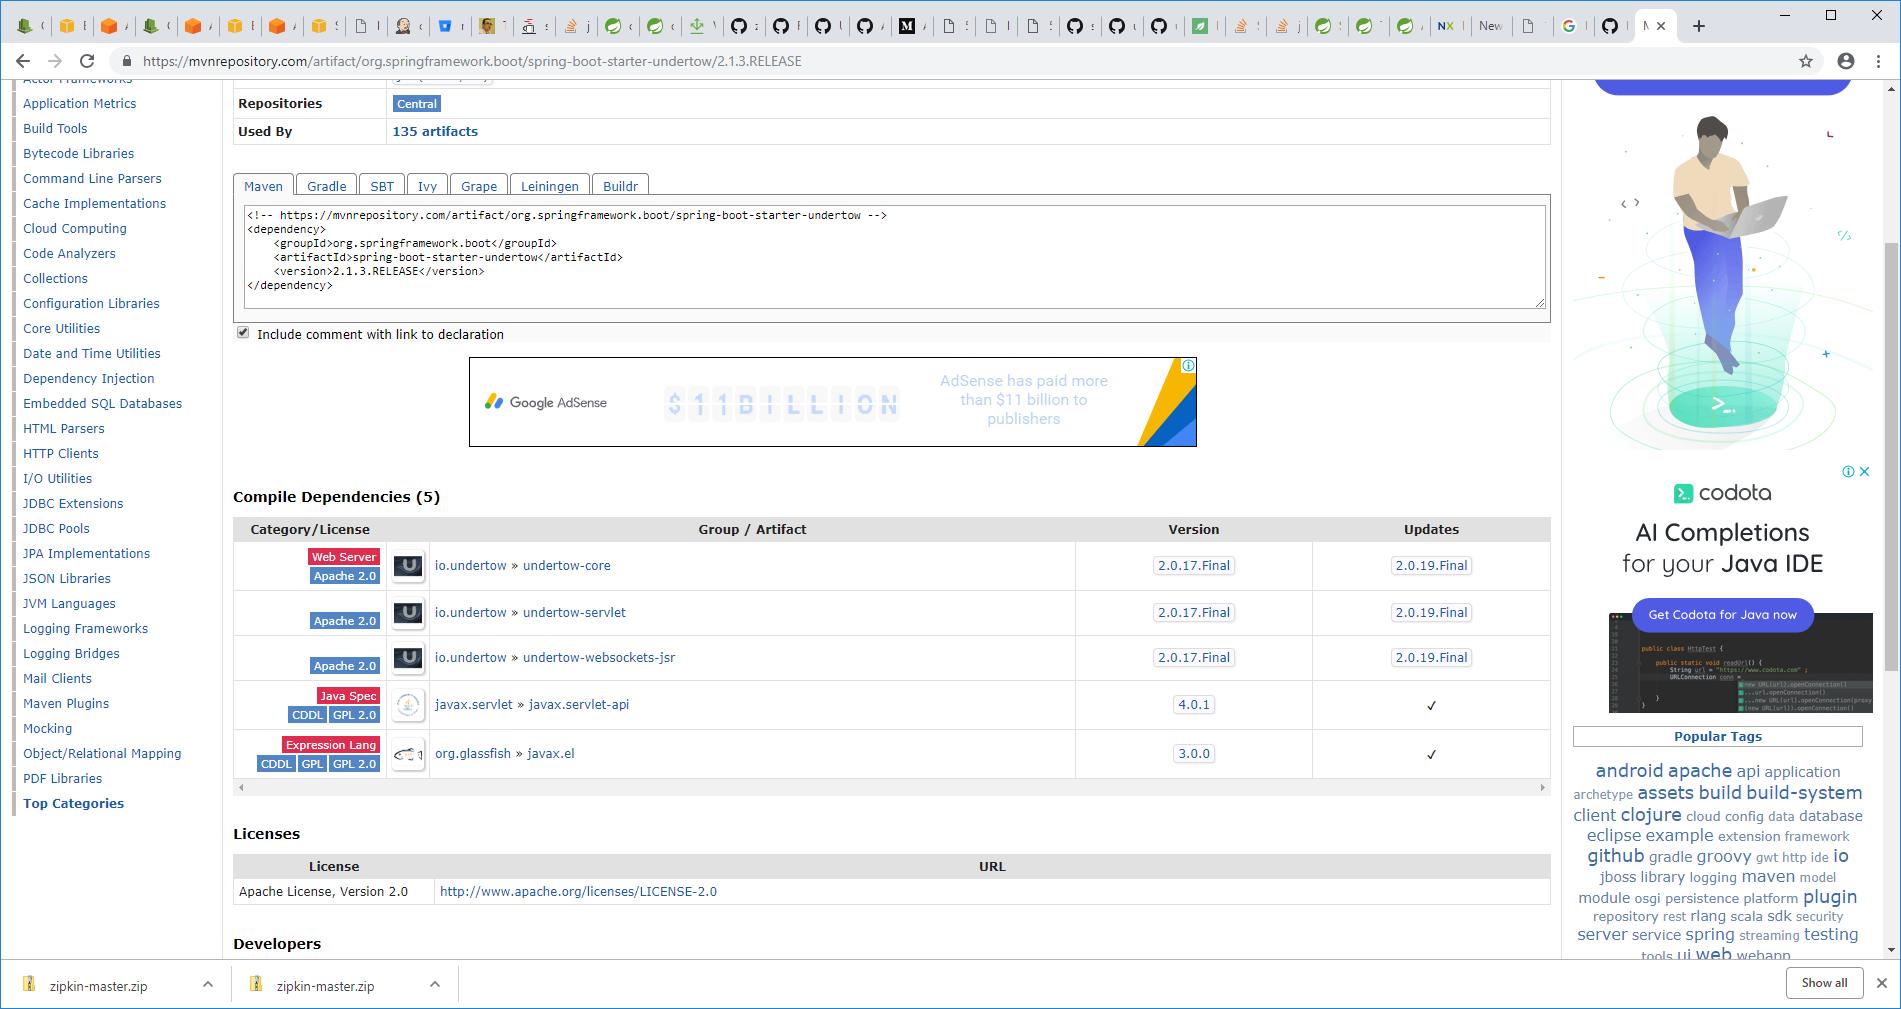 Running as ecs container on aws · Issue #2420 · openzipkin/zipkin